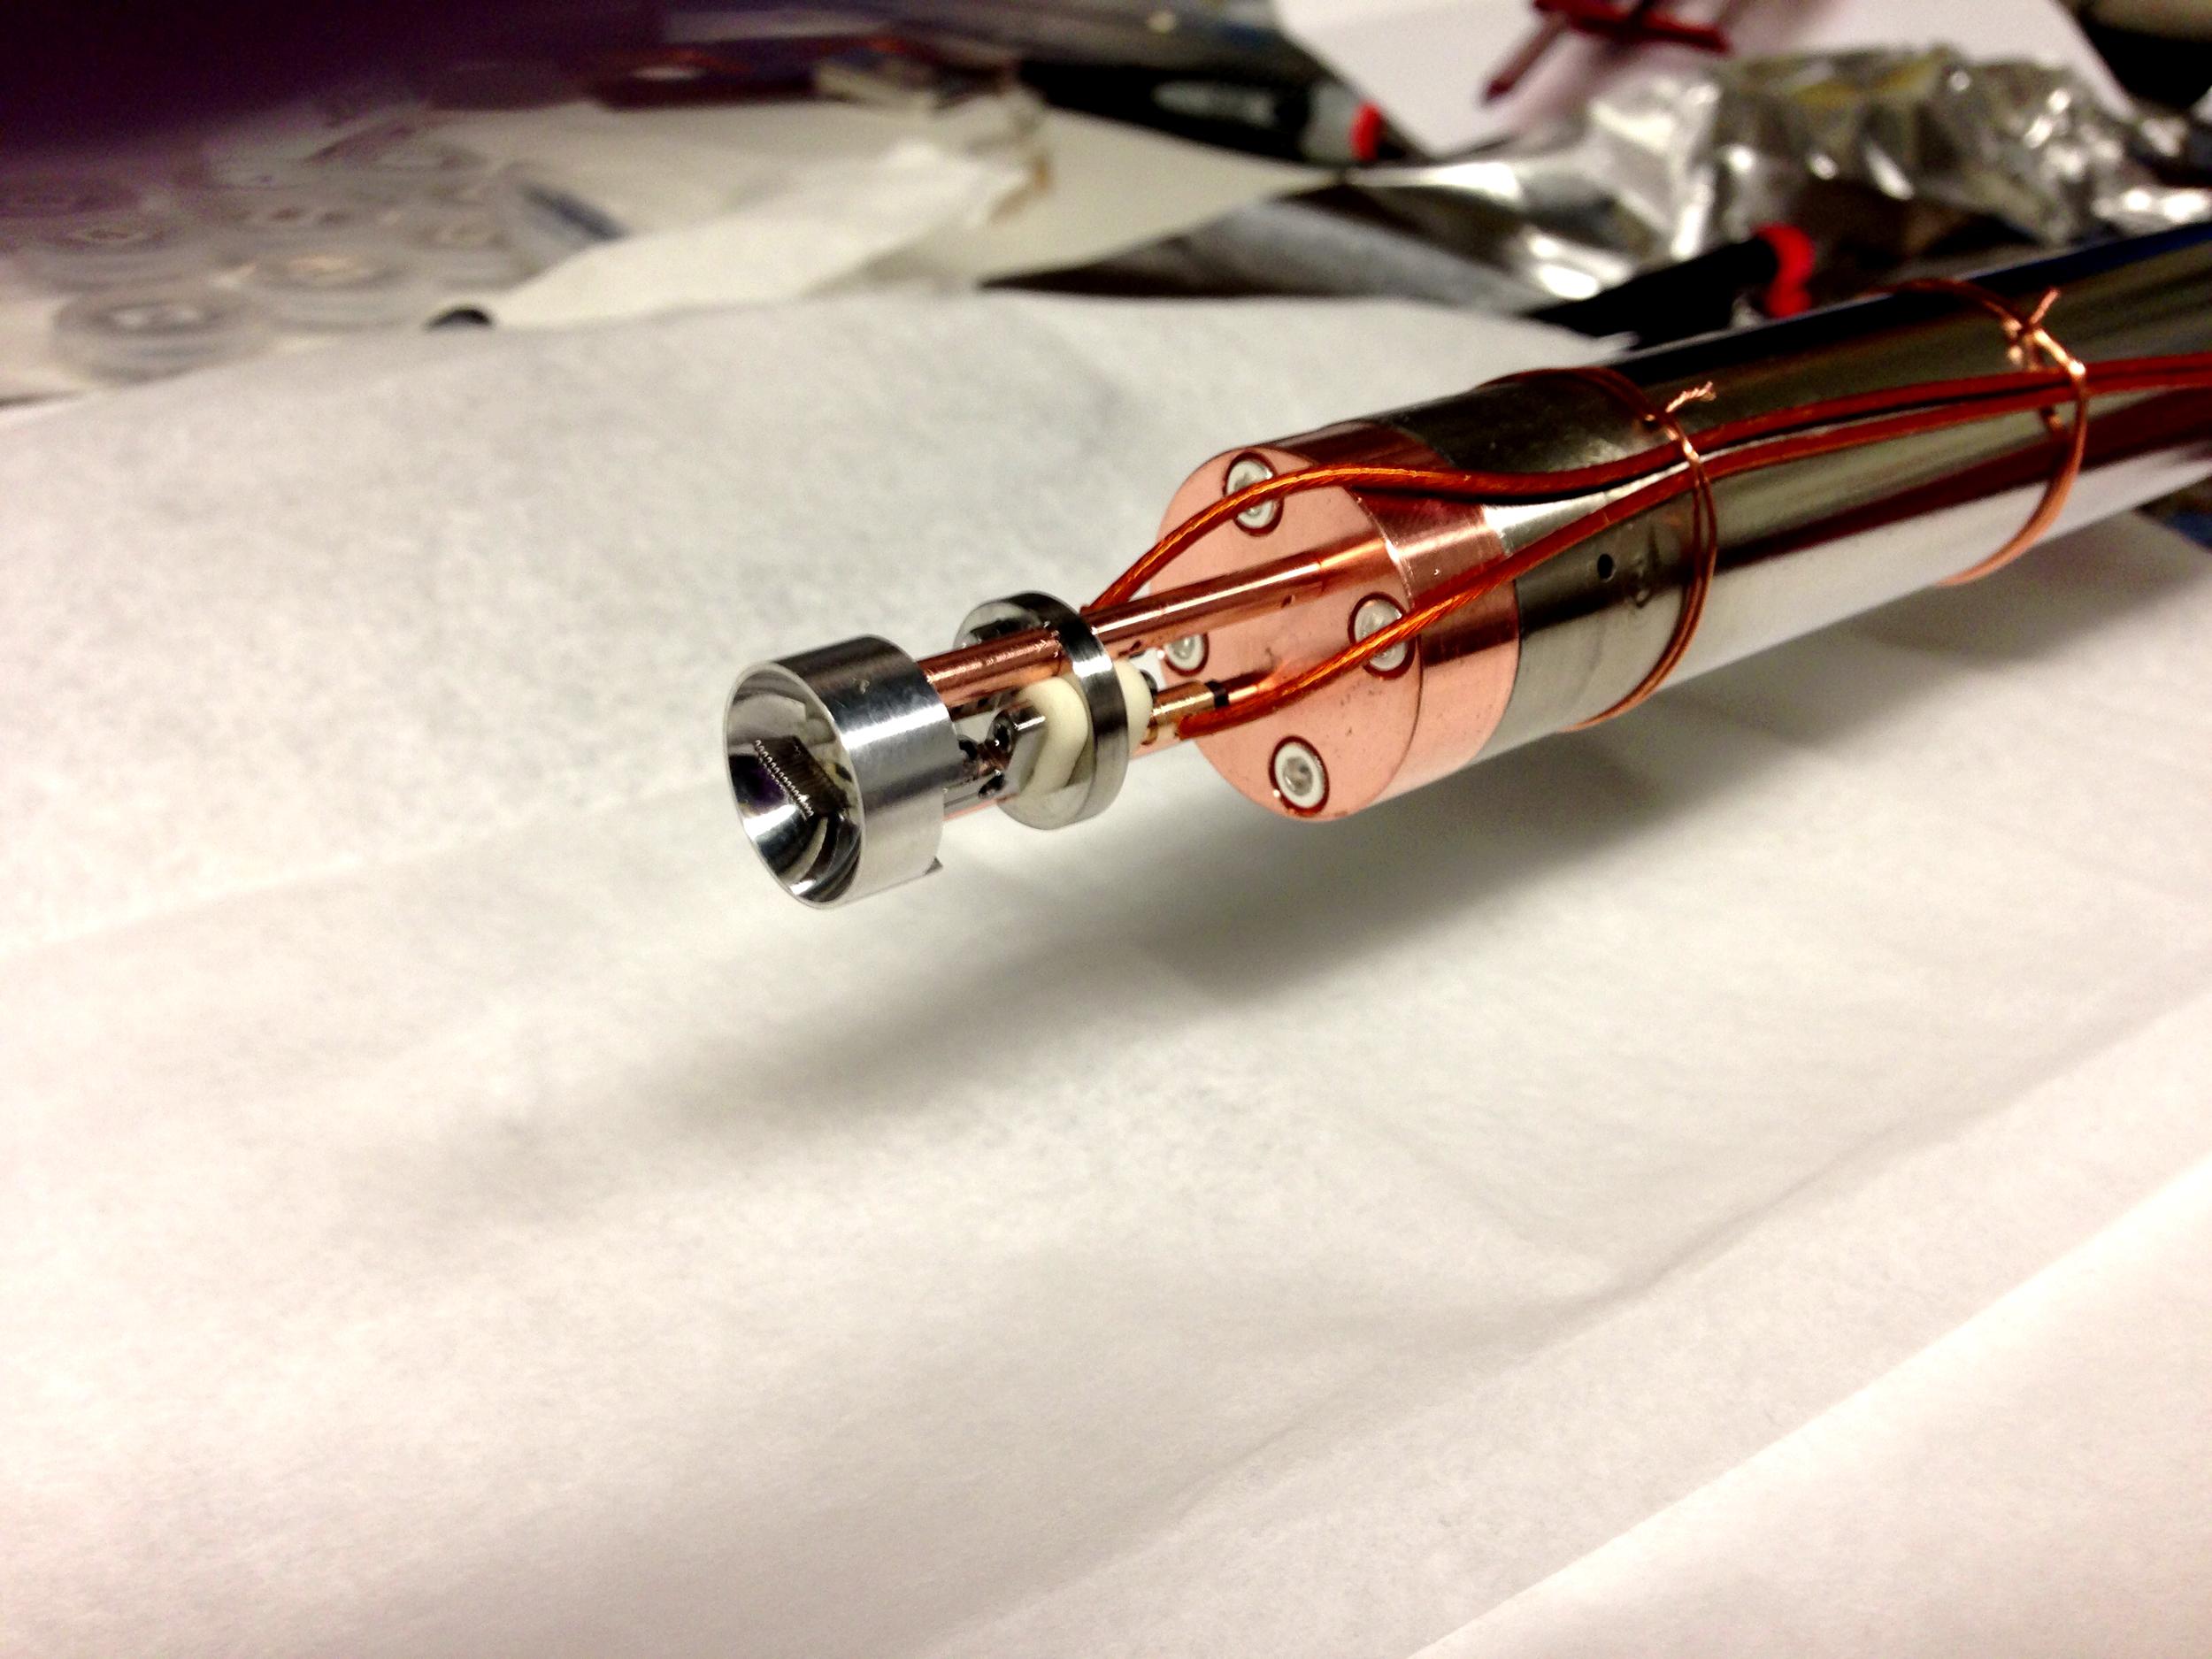 APEX Photocathode Deposition Heating System